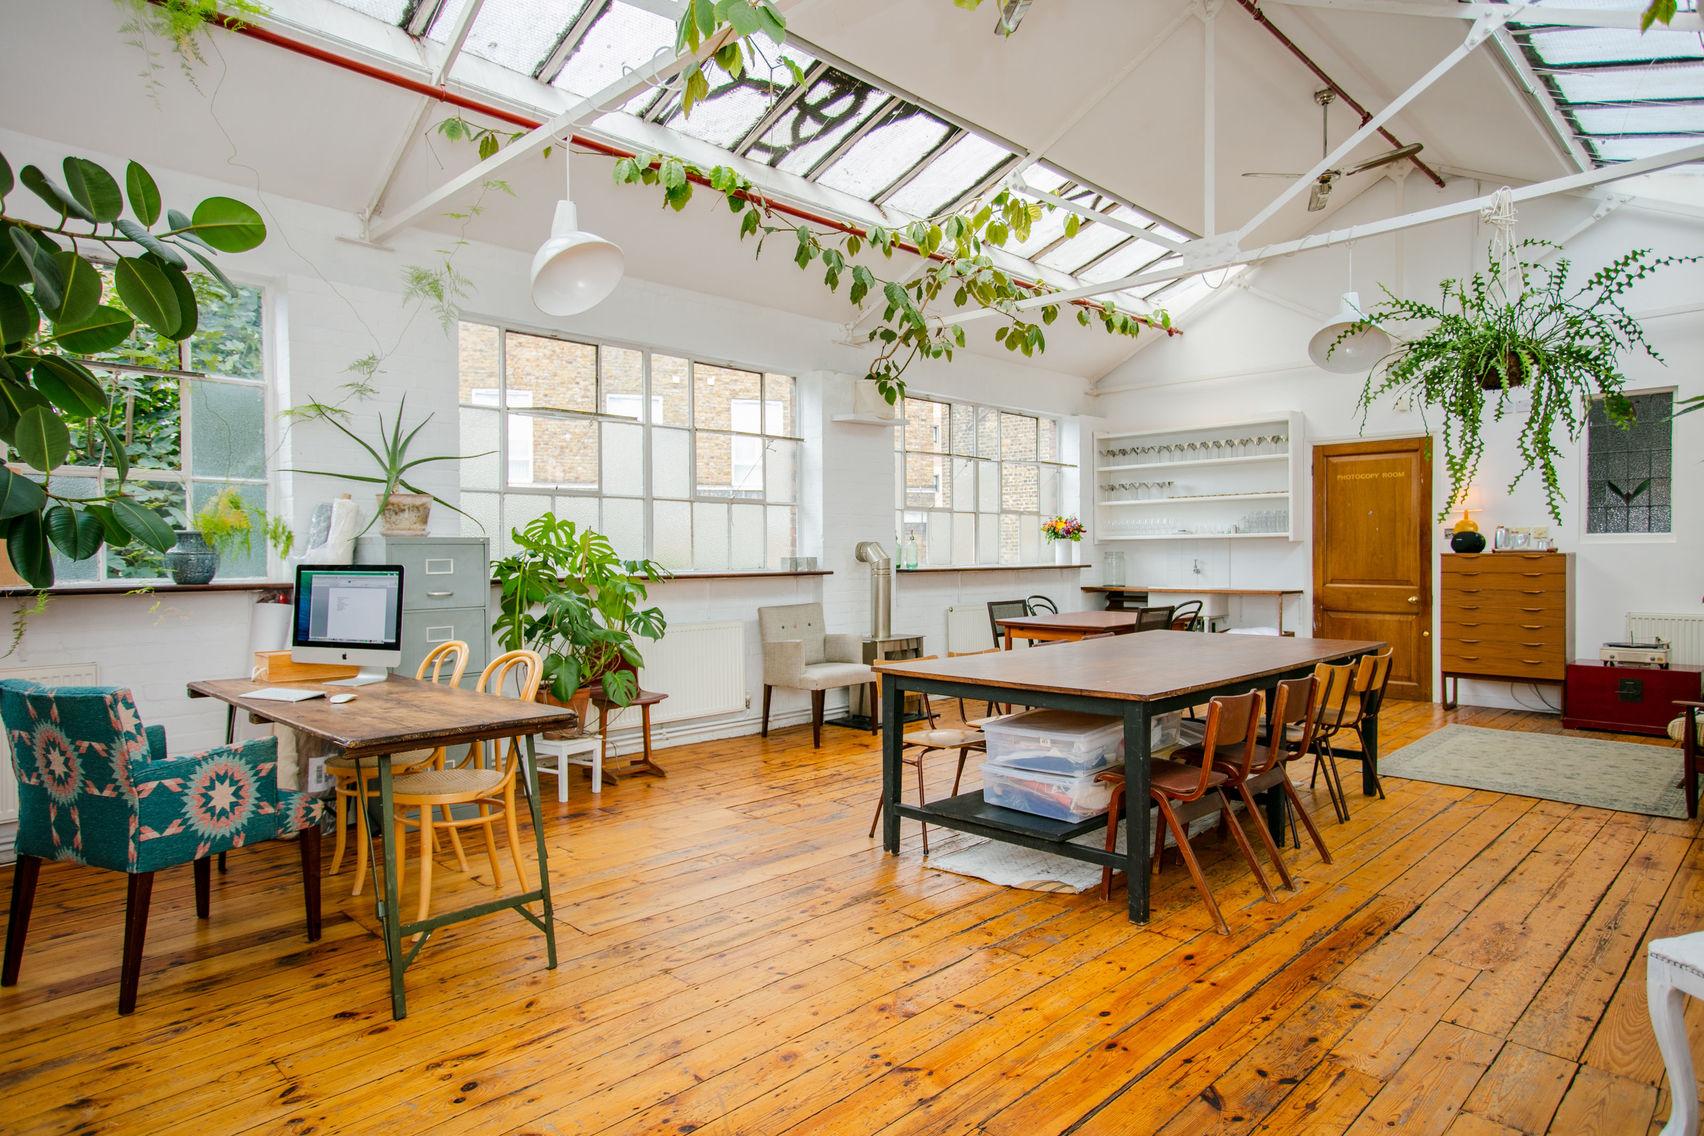 Photographic studio and studio kitchen, Cocina Shoreditch